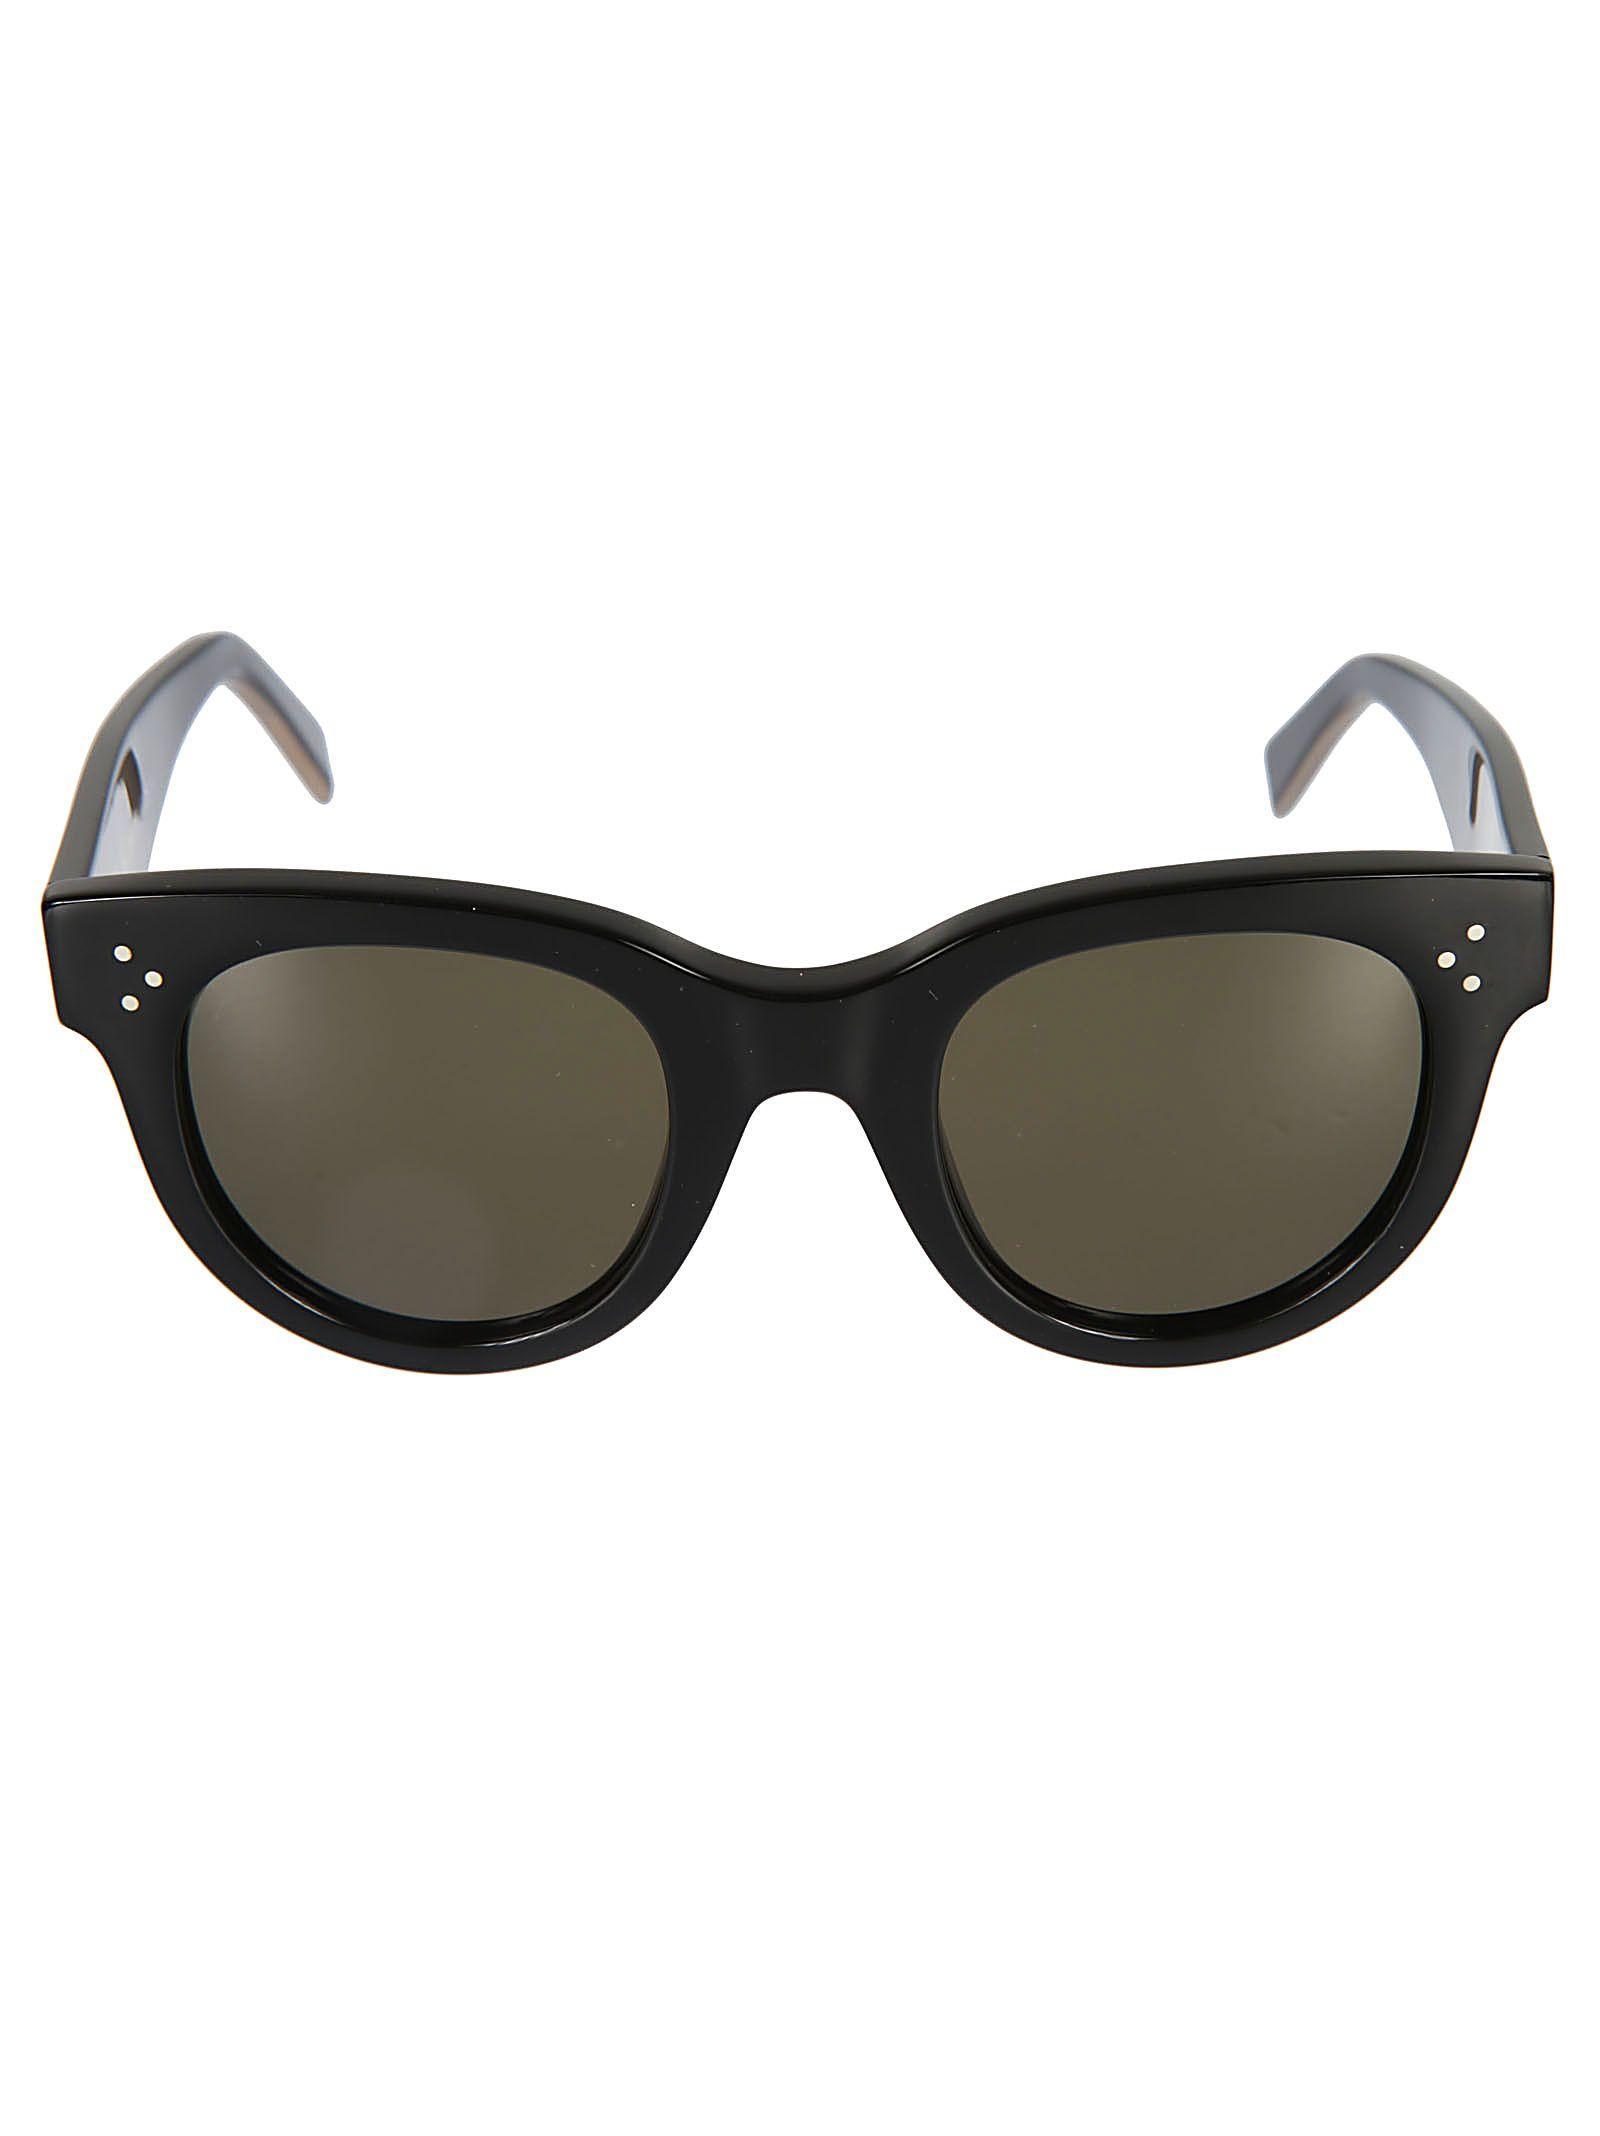 ab7daf994baf Celine Classic Sunglasses In Black | ModeSens